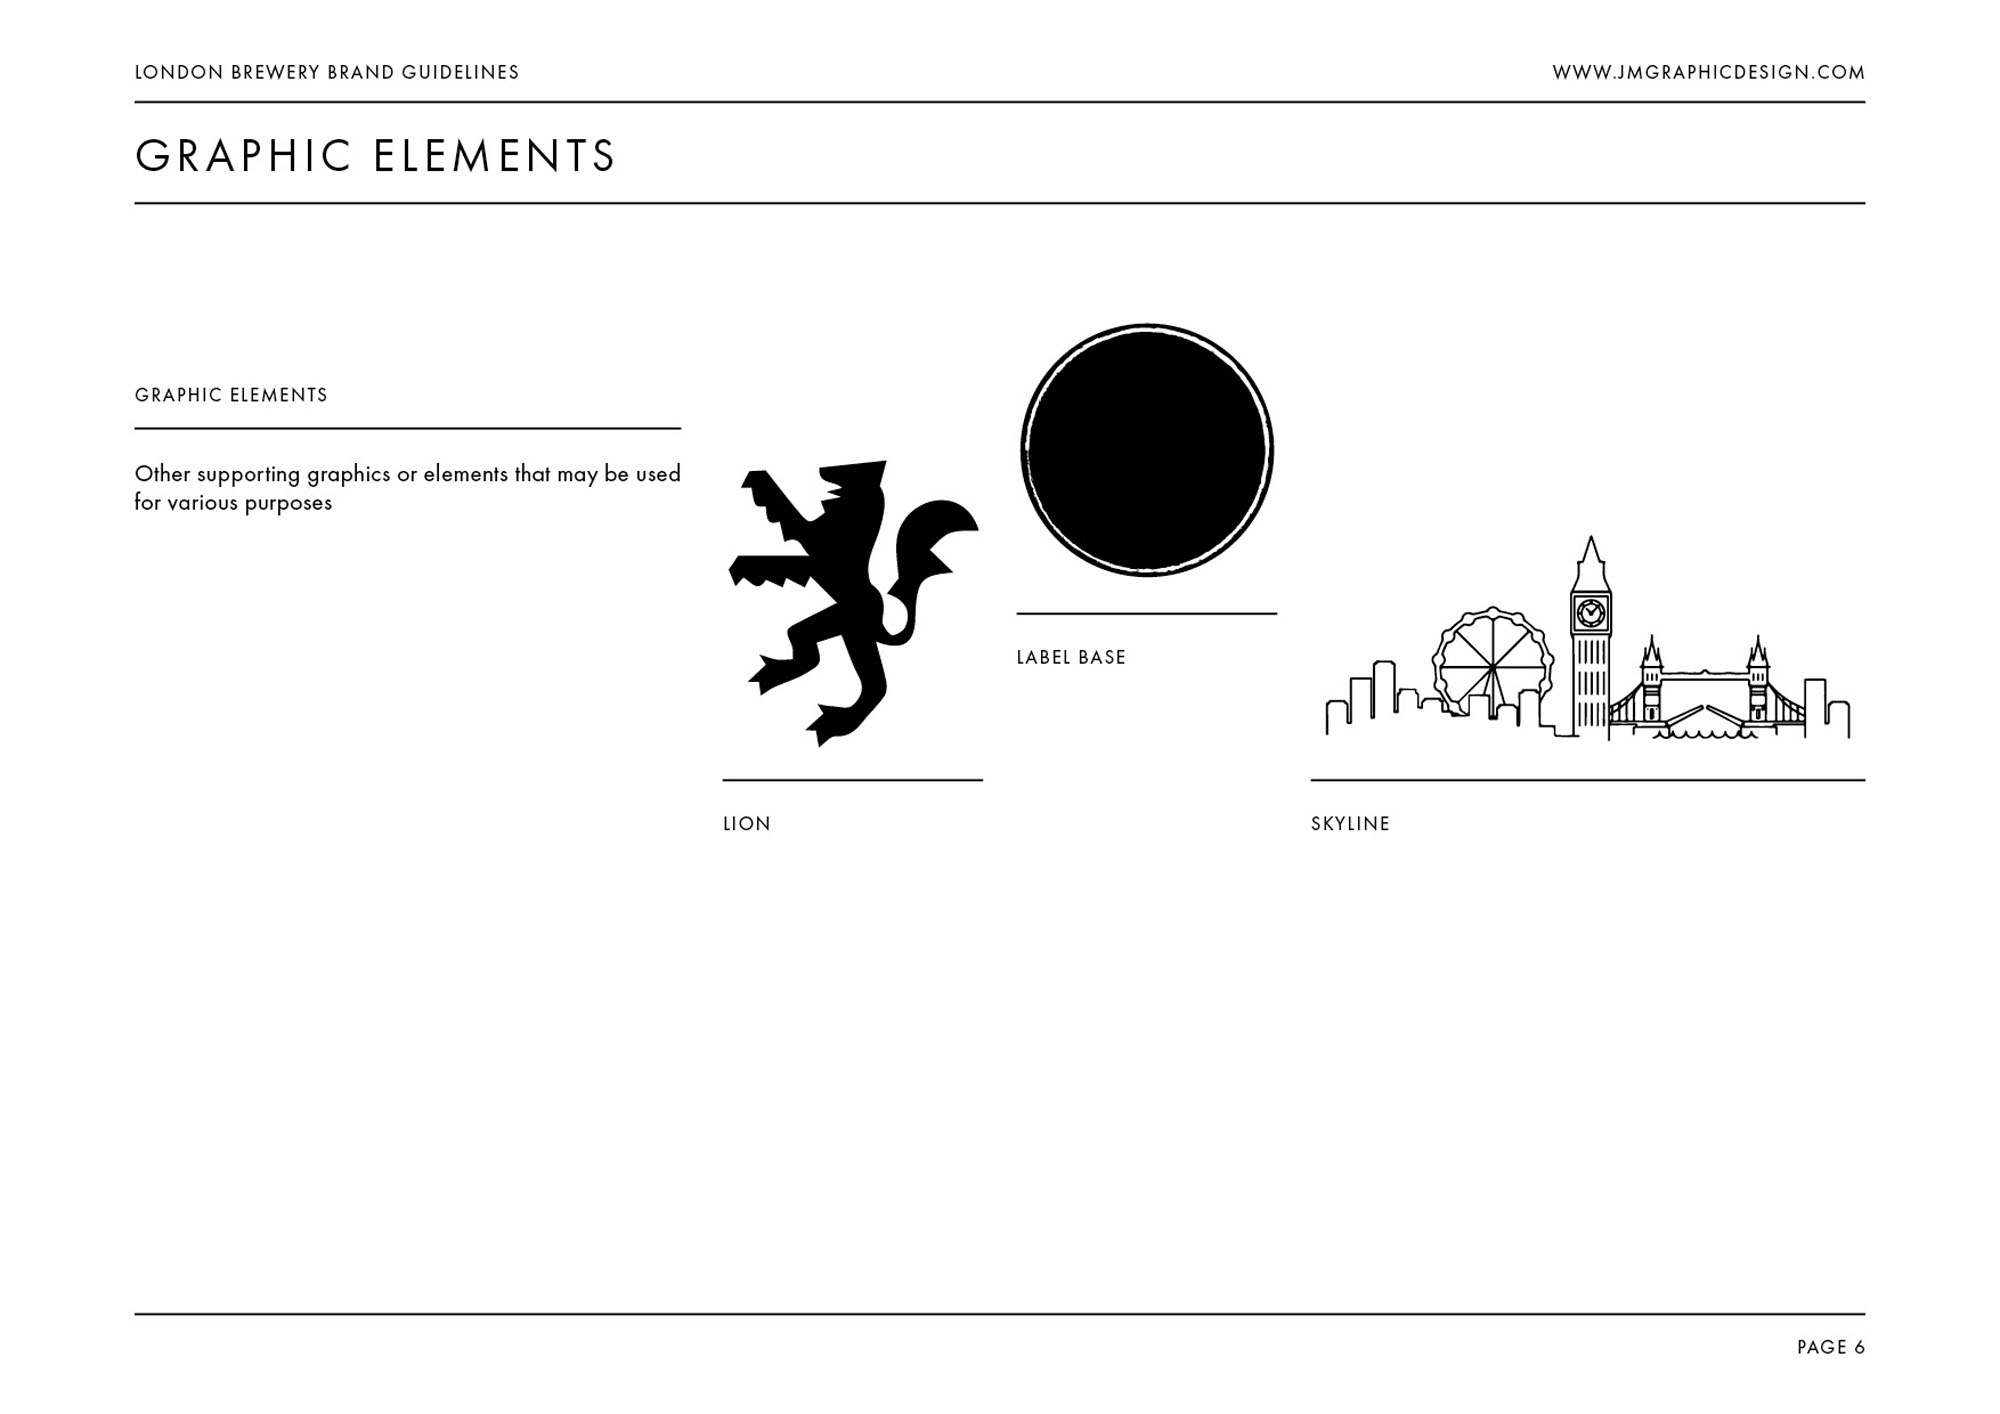 breverage-packaging-design-london